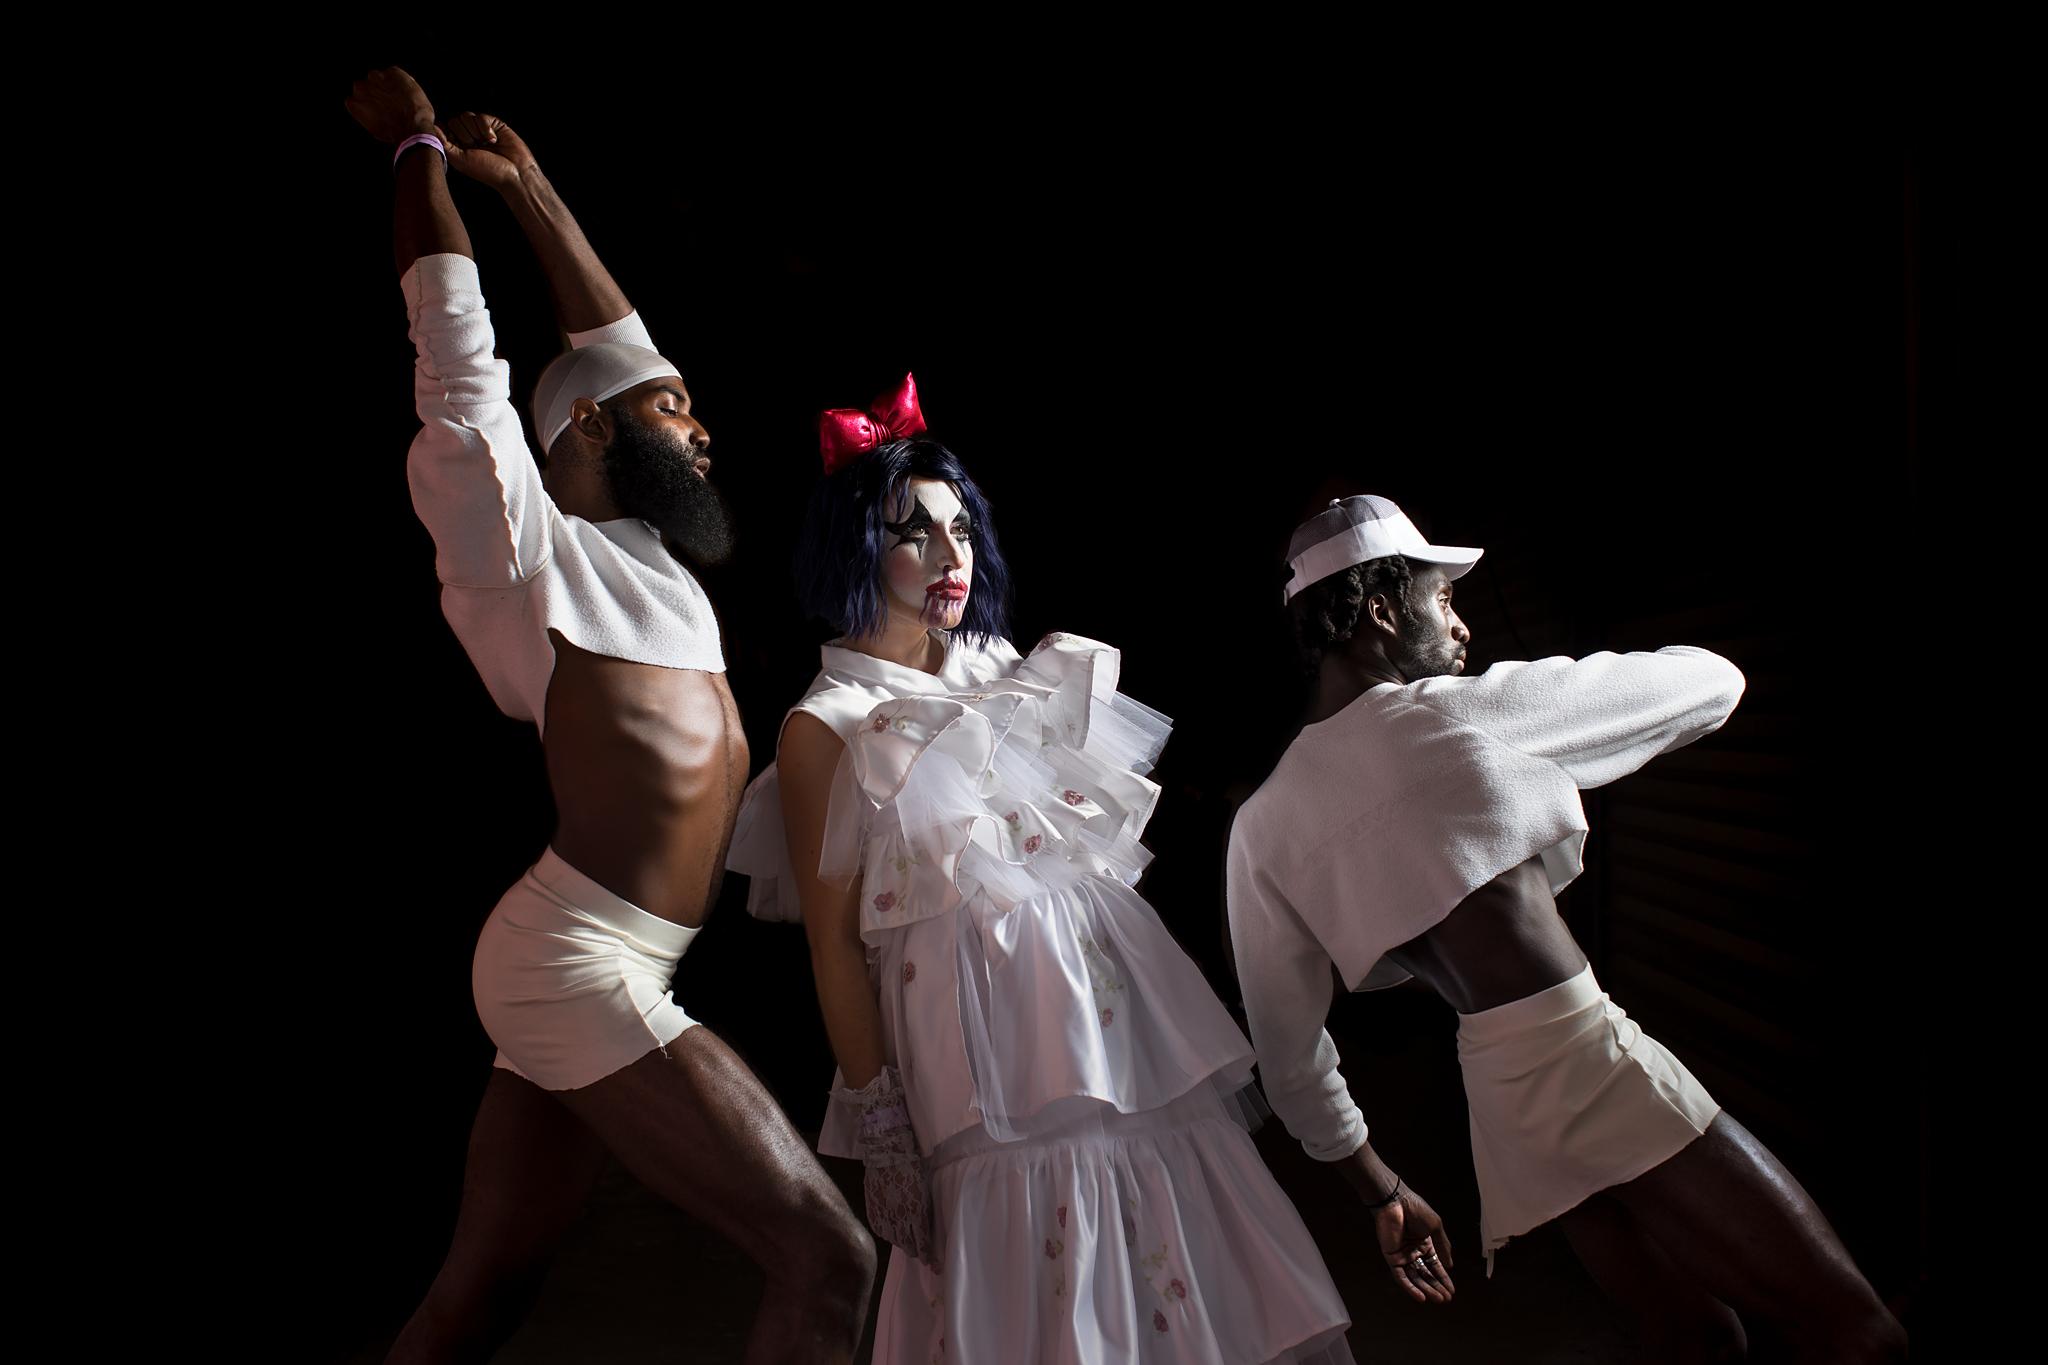 Matte Black Soul, Esther Is A Little Girl, and DeVonn - Bushwig, 2017